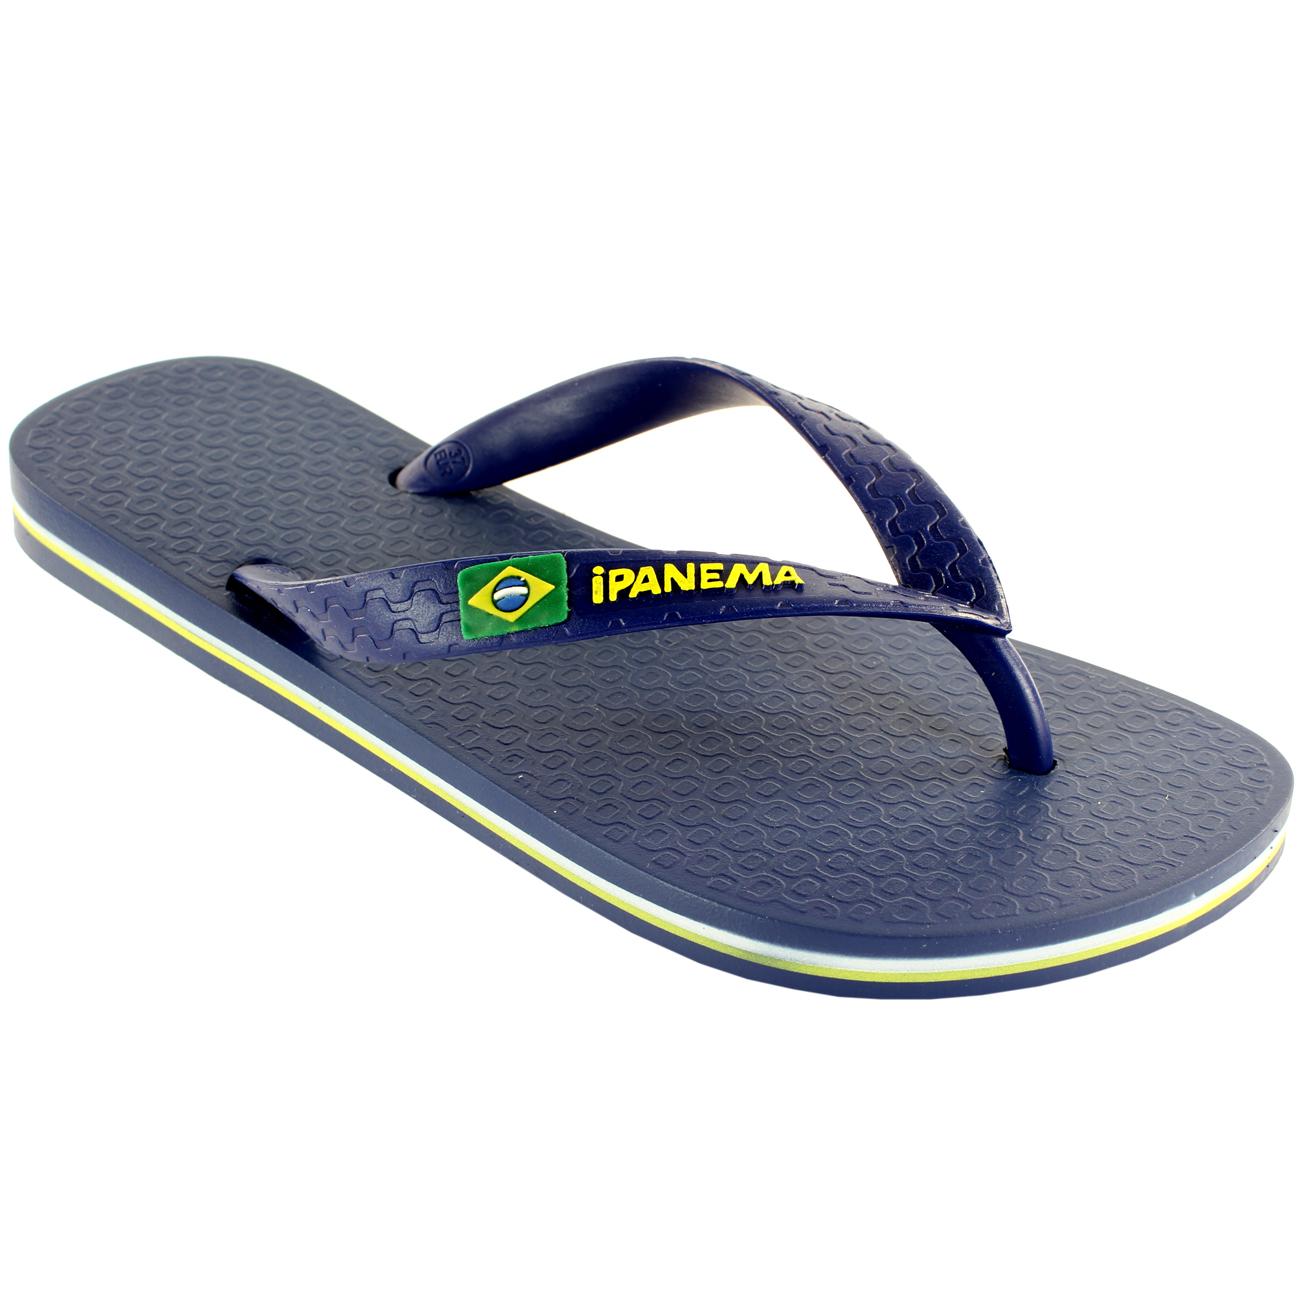 designer flip flops 4qko  WOMENS-IPANEMA-BRAZIL-FLIP-FLOPS-SANDALS-LADIES-DESIGNER